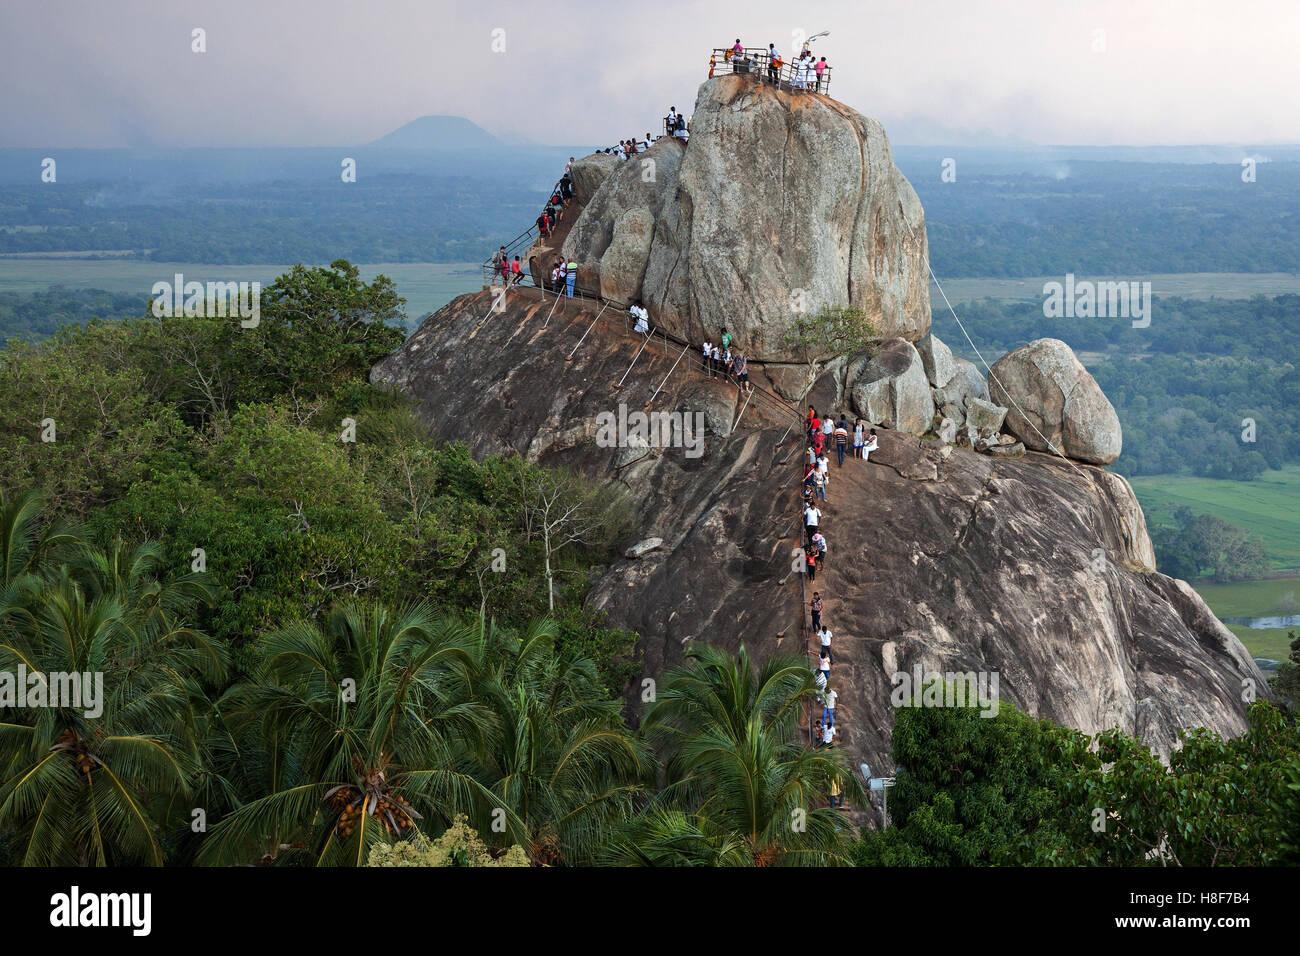 People on Rock of Invitation, Aradhana Gala, Sila Rock, Mihintale, North Central Province, Sri Lanka - Stock Image